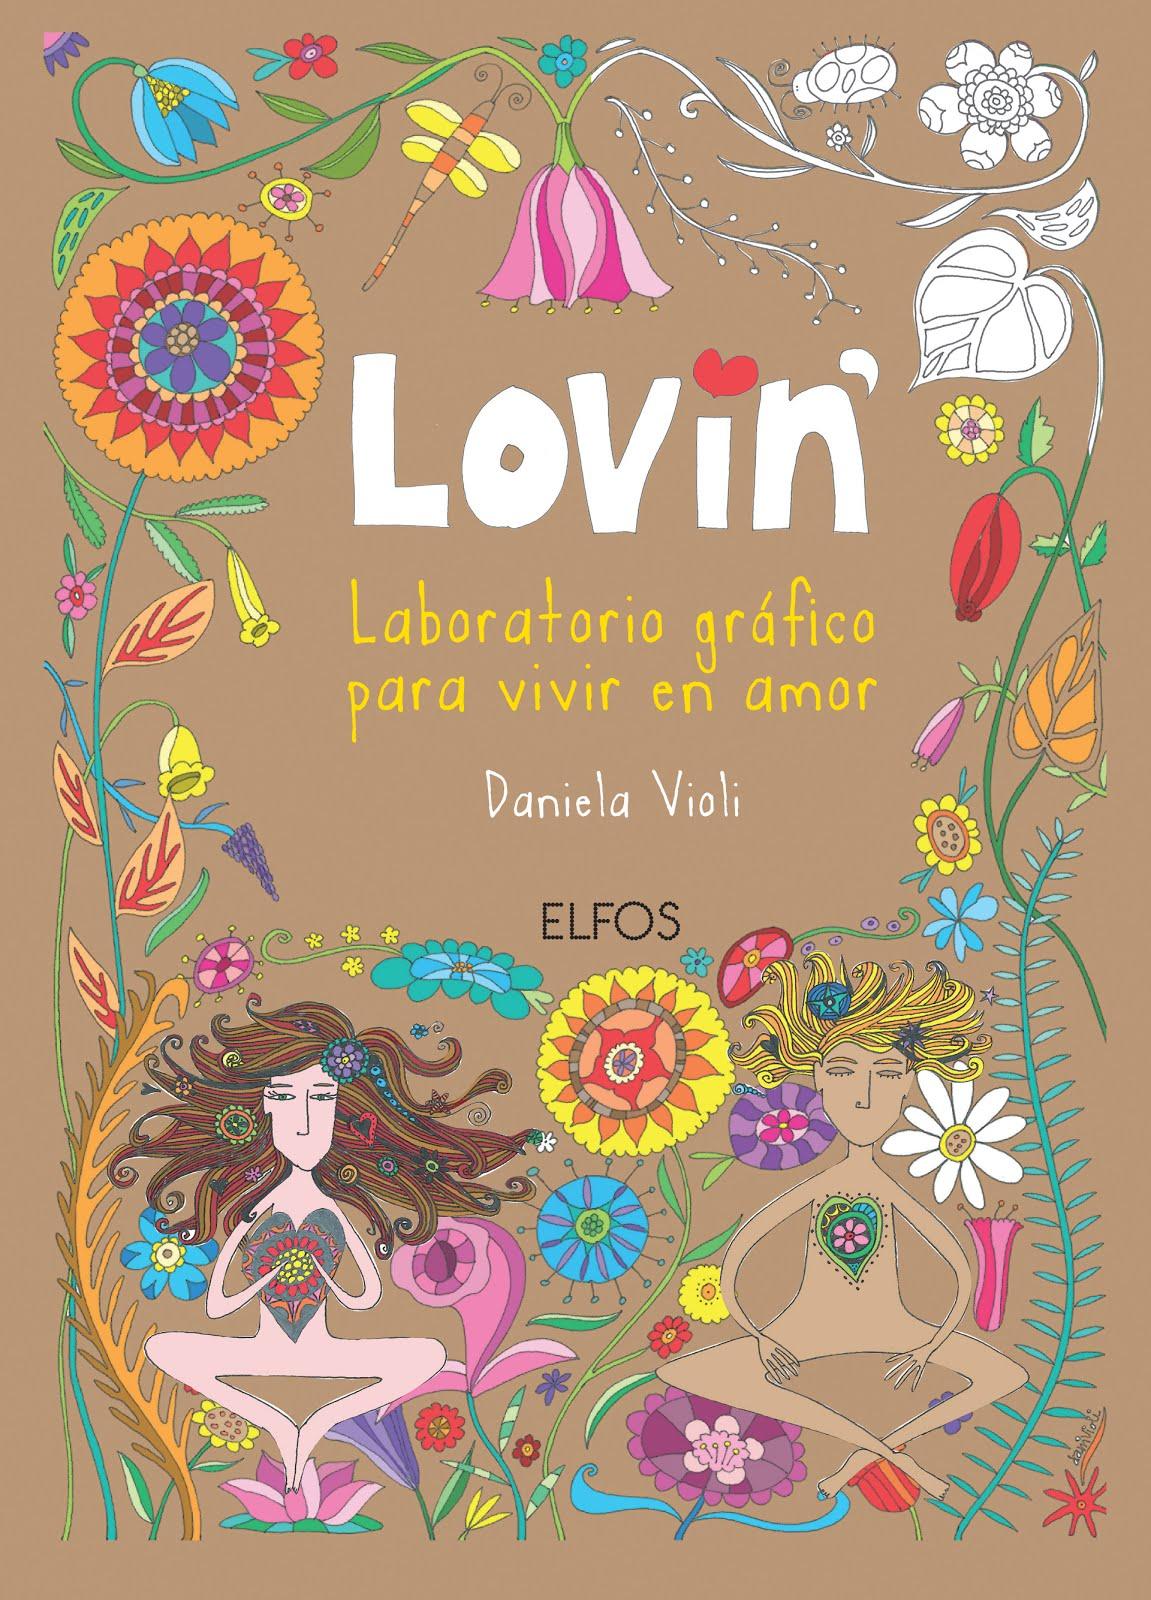 Lovin' Laboratorio gráfico para vivir en amor